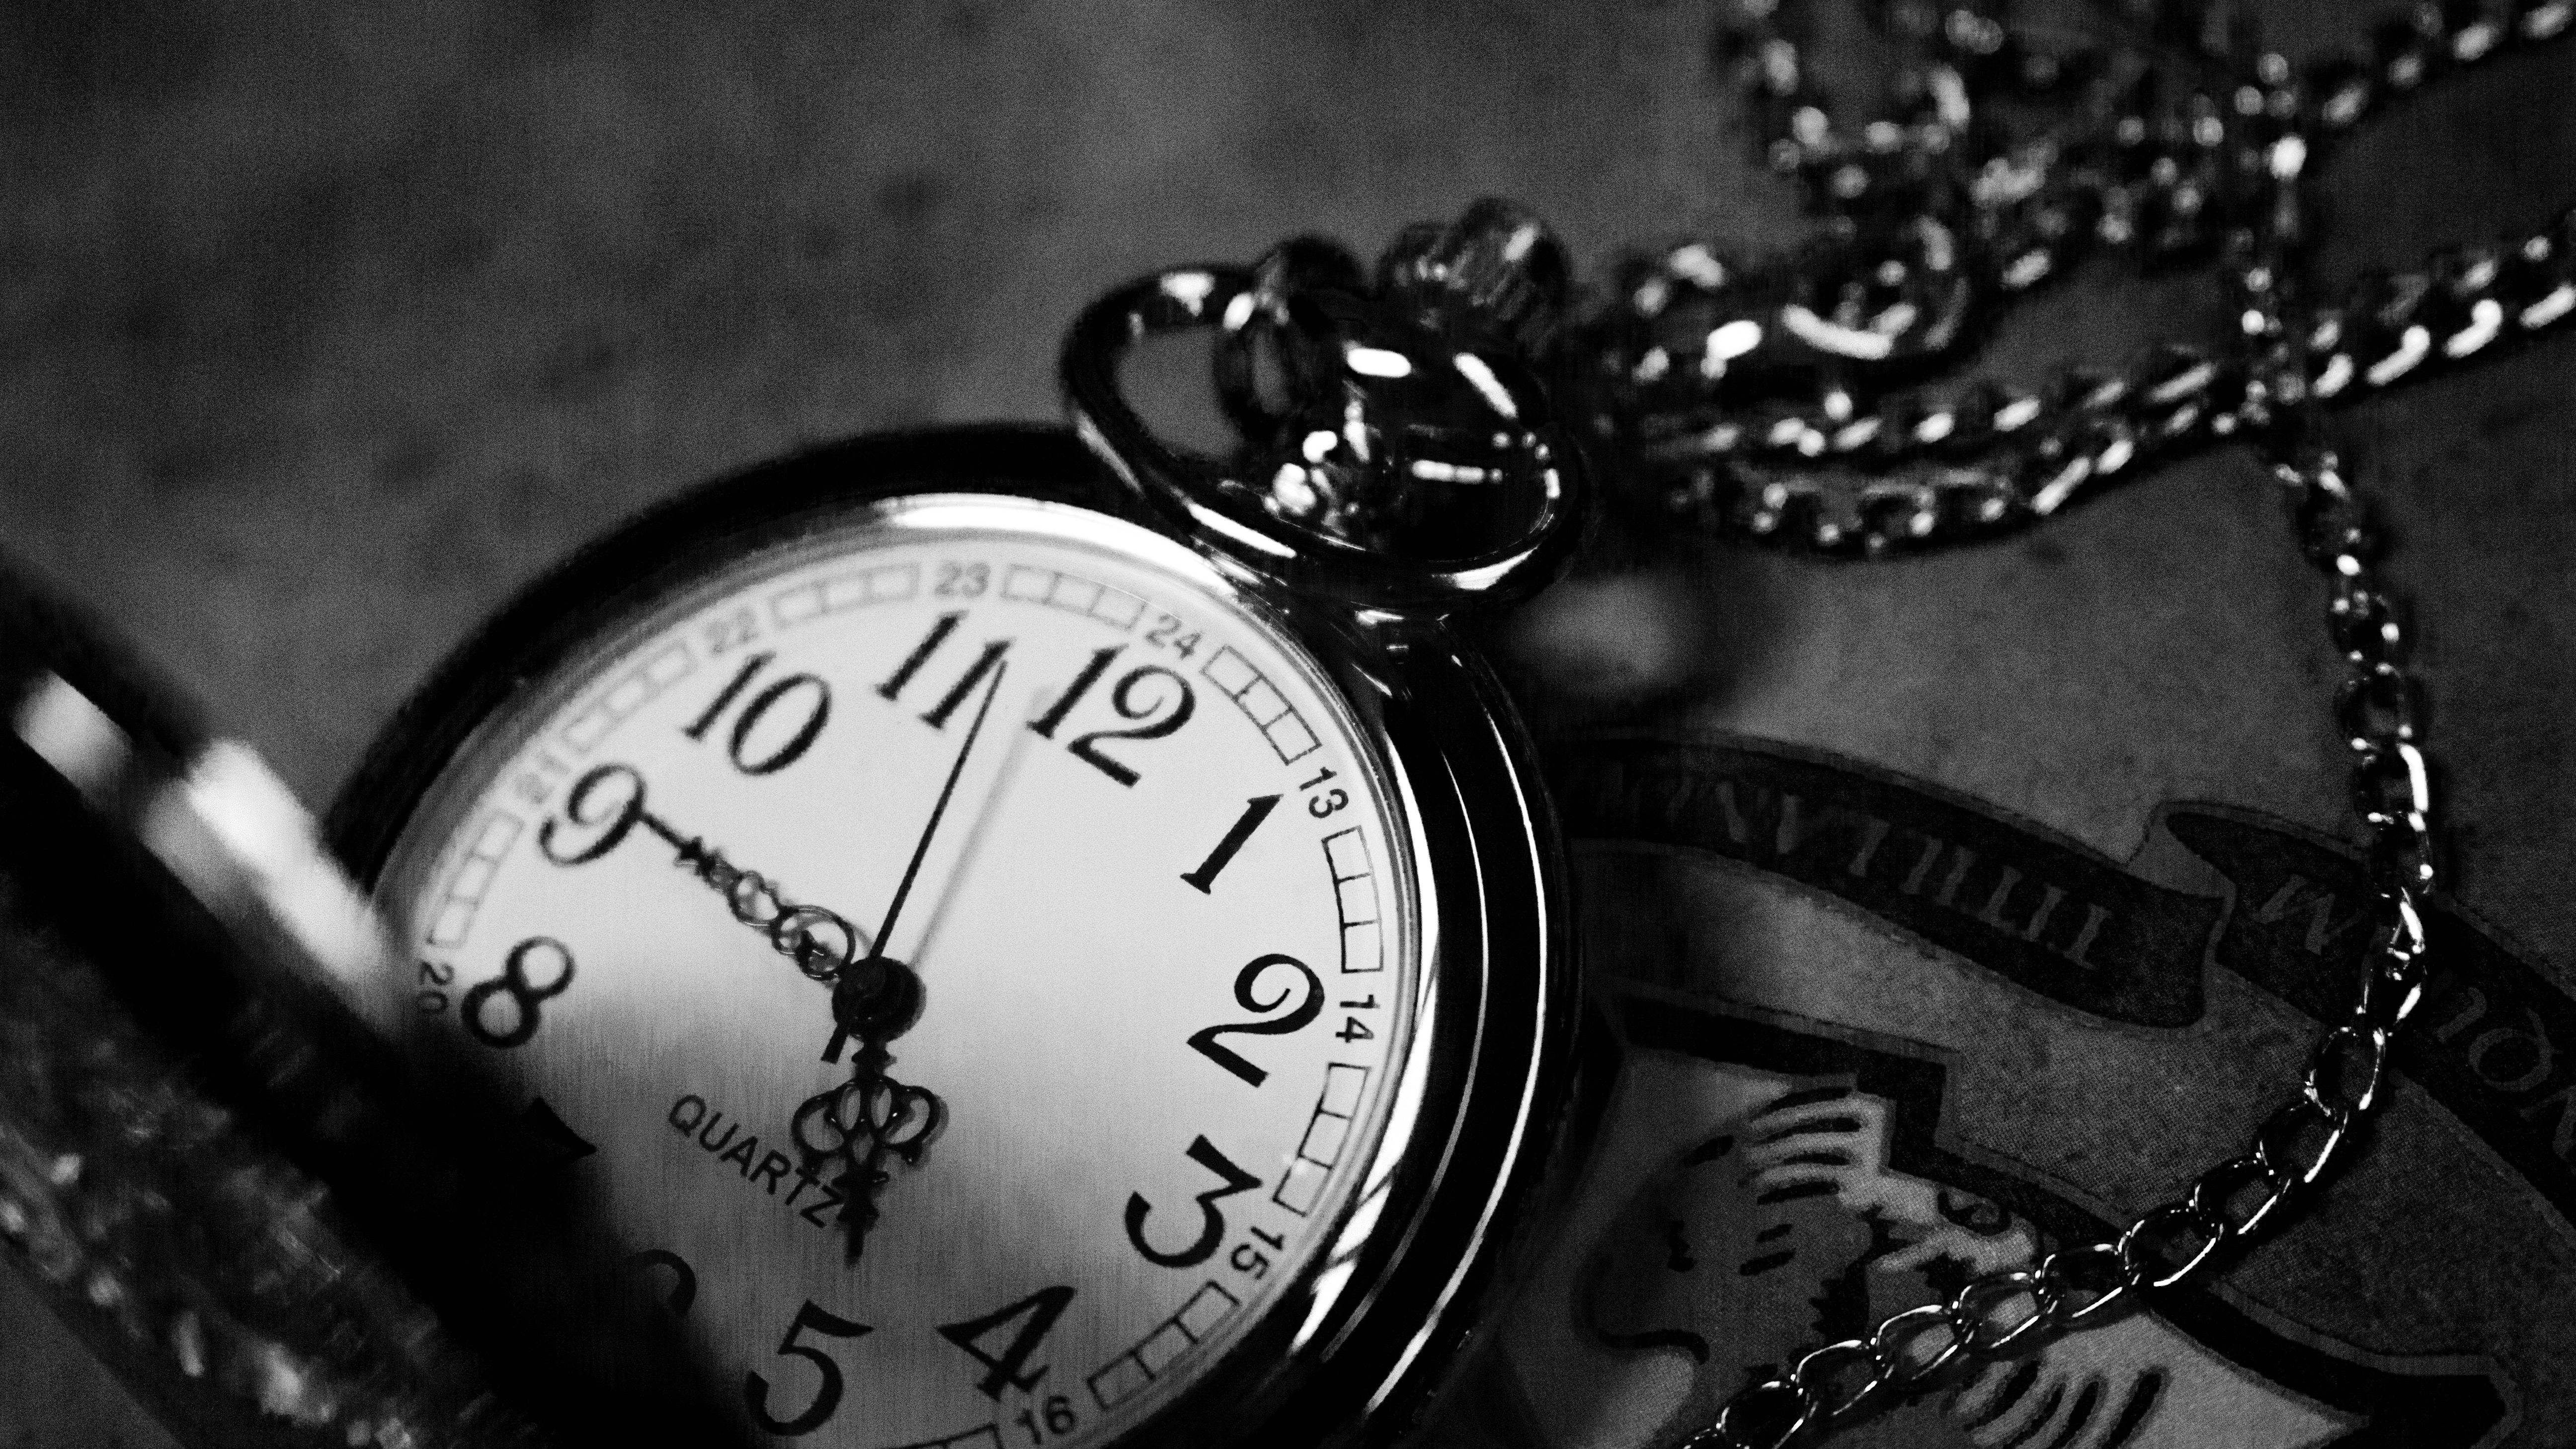 Do You Feel, Lost, and Confused? Read This Article... | Gerardo Morillo | Prosperitylifehacks.com